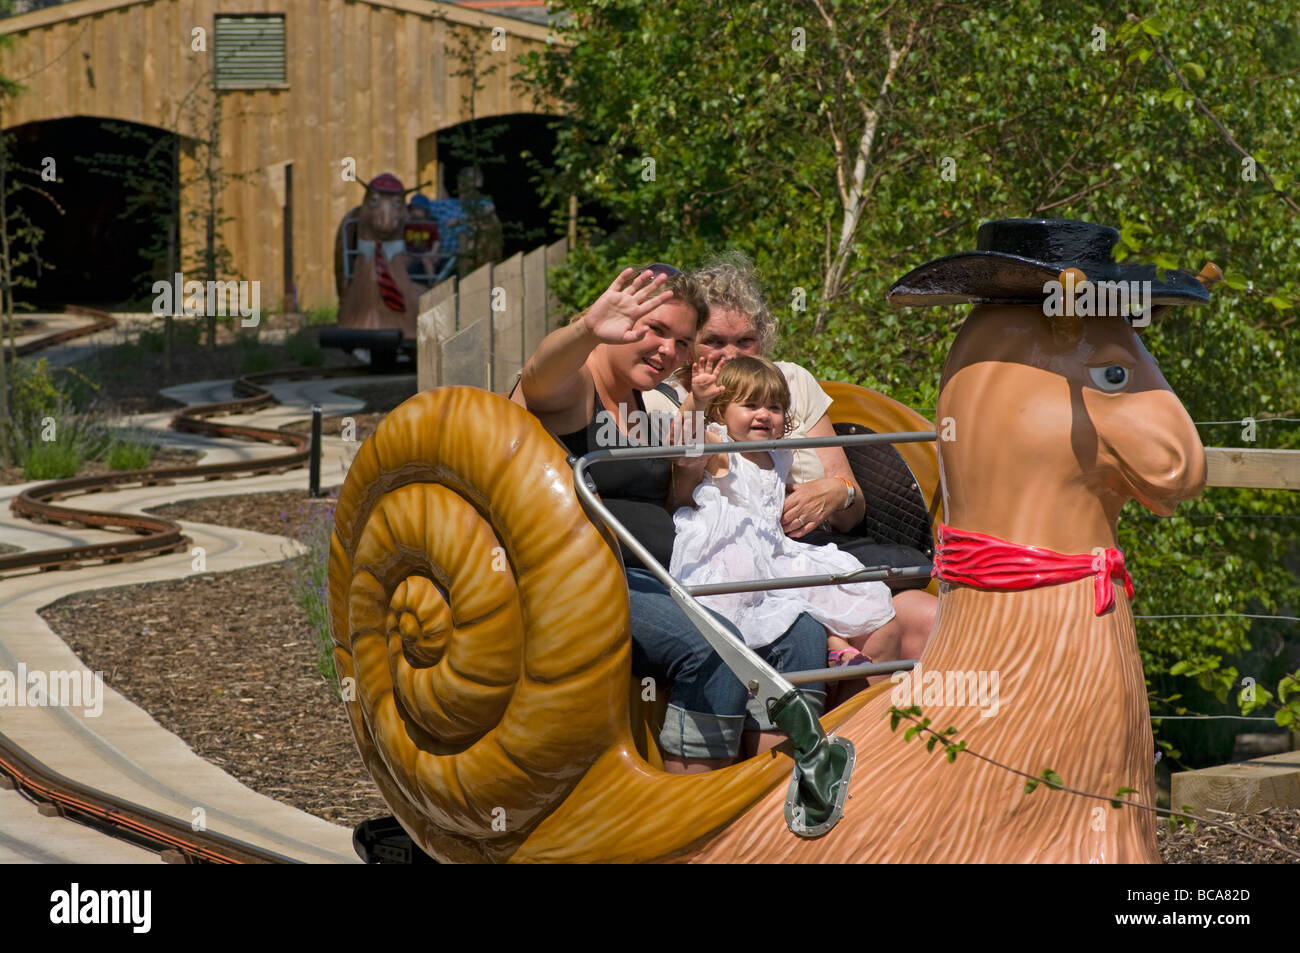 3 Generations Riding an Amusement Park Snail Ride - Stock Image